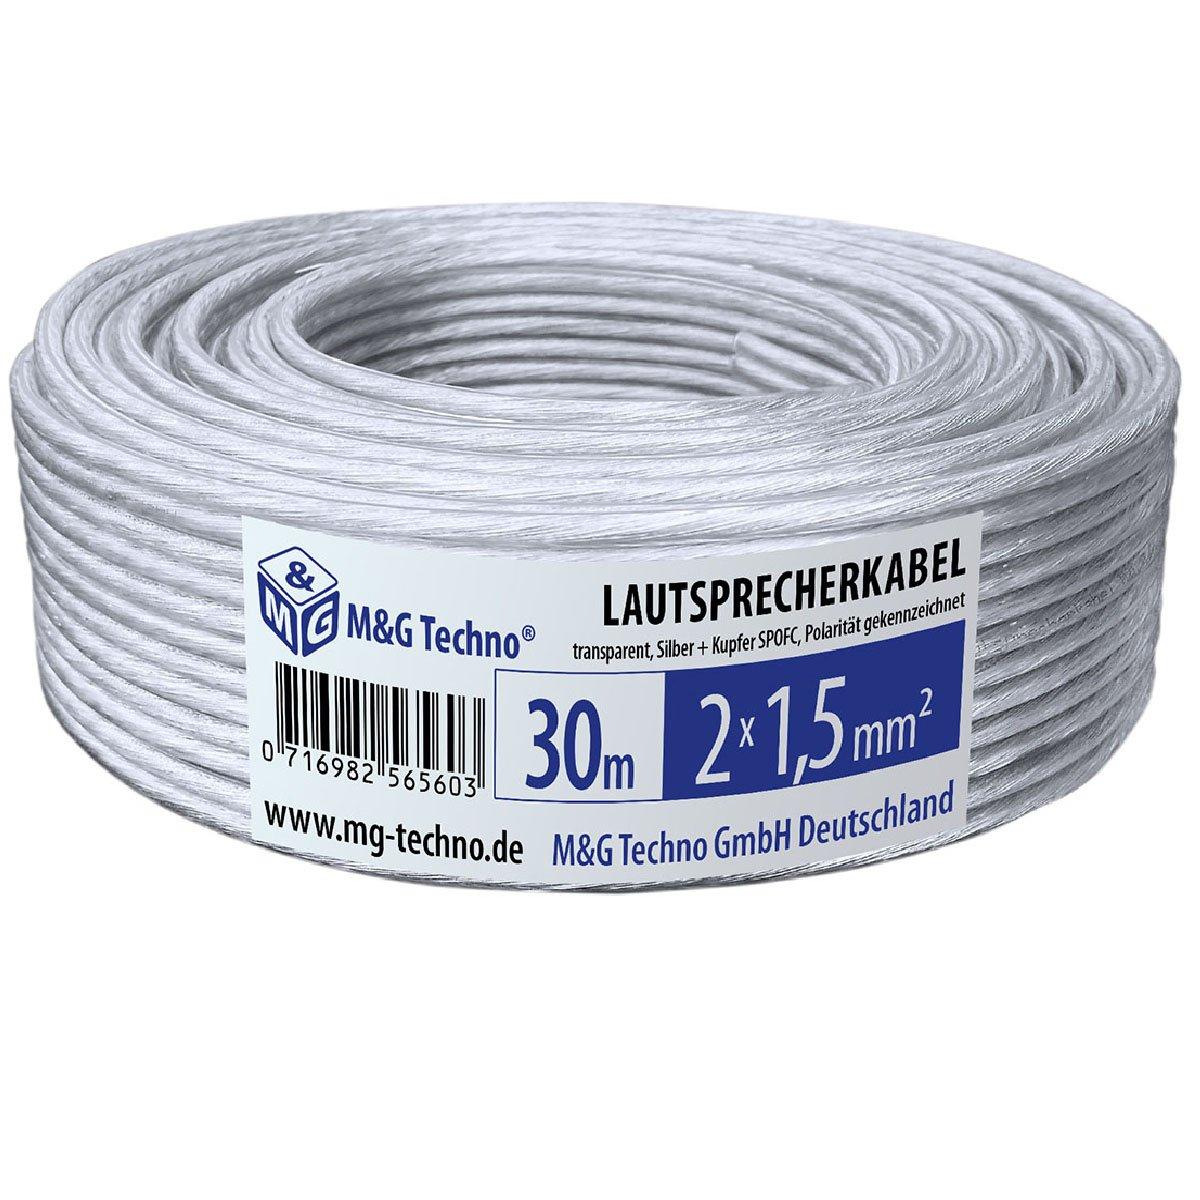 30m Lautsprecherkabel 2x1,5mm², rund, Transparent, SPOFC, Silber + ...